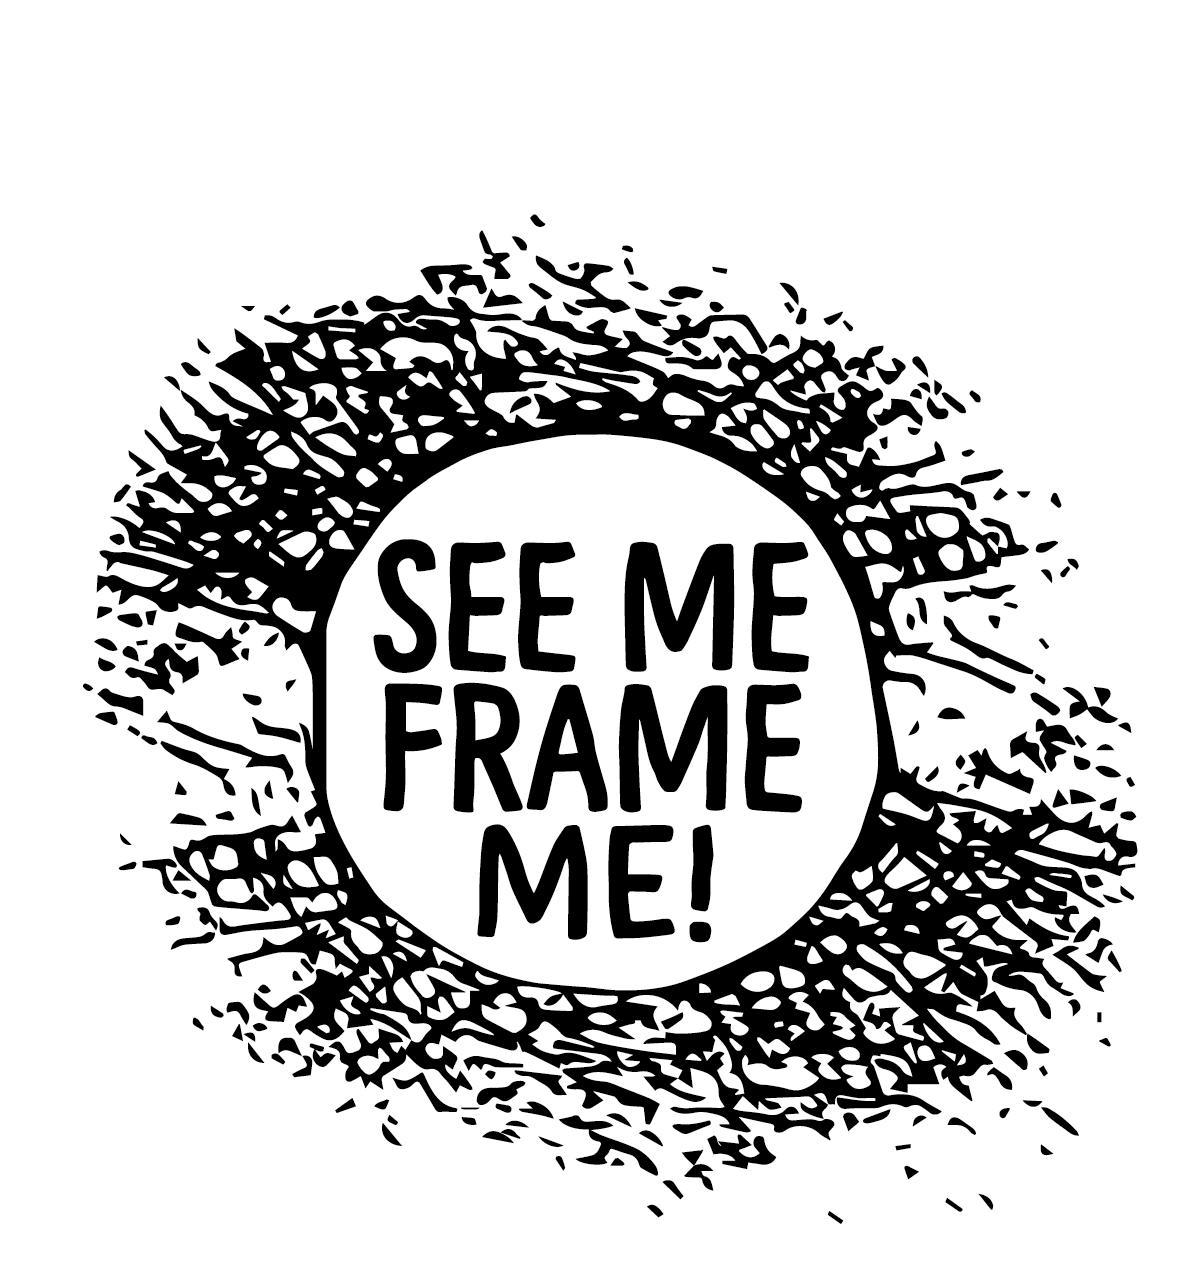 SEE ME, FRAME ME!